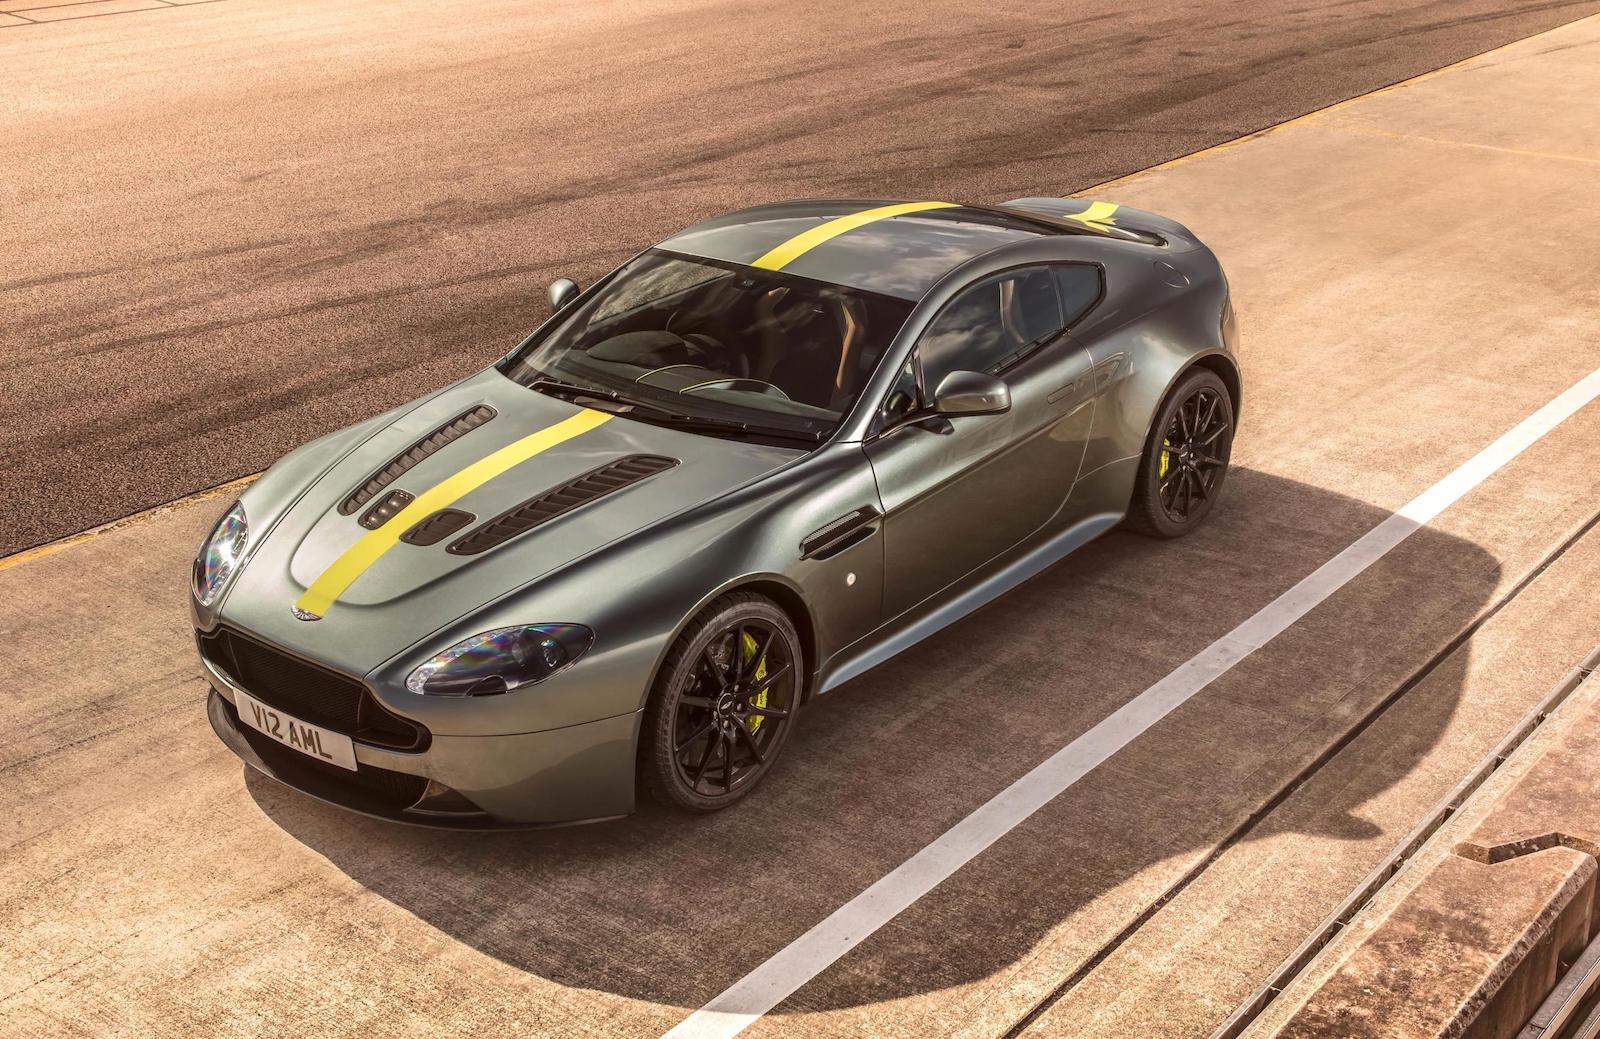 Aston Martin Vantage Amr Is Last Hurrah For Current Gen